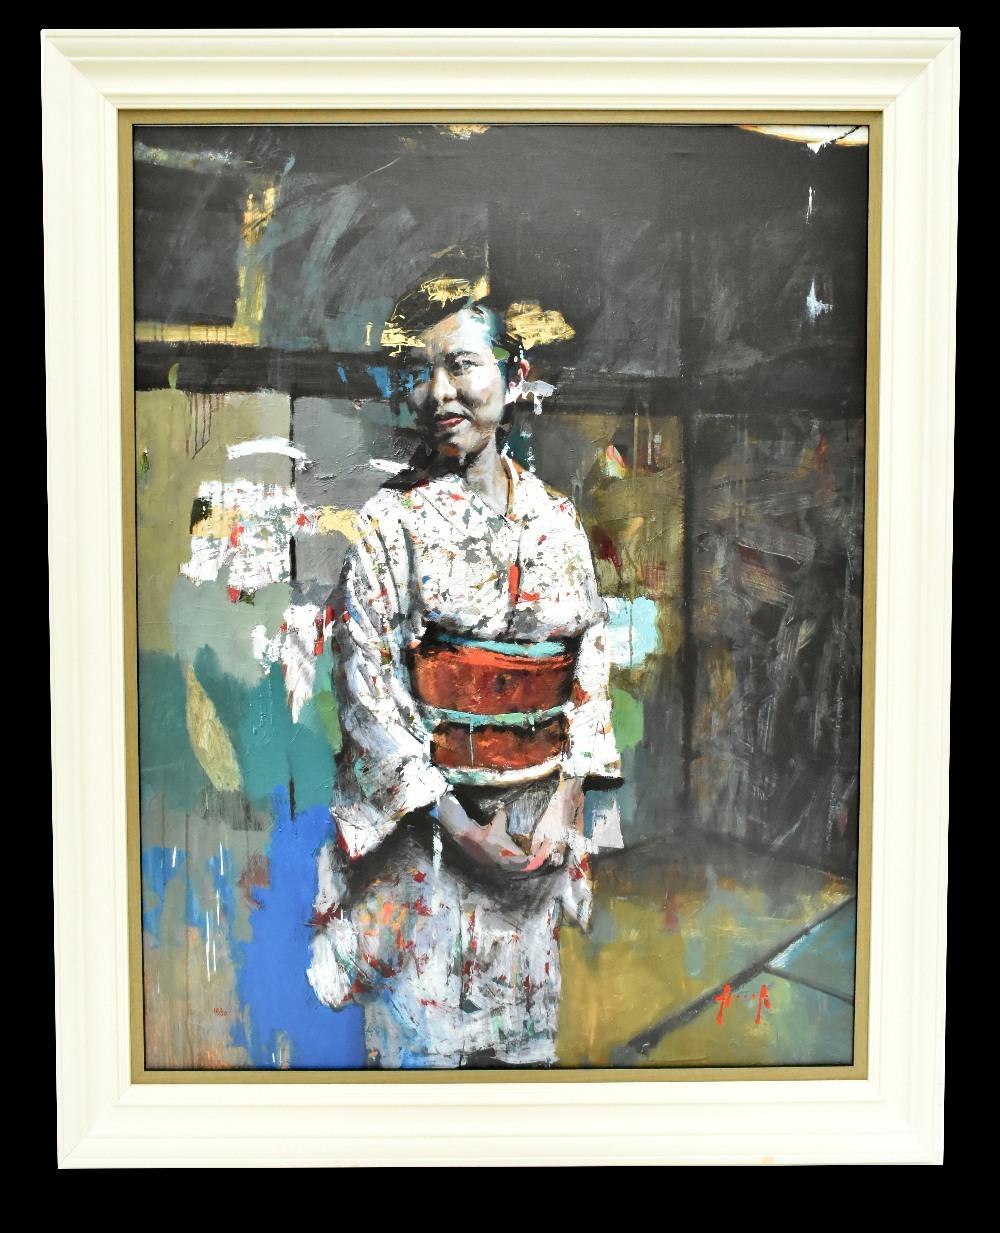 CHRISTIAN HOOK (born 1971); signed limited edition print on board, 'Chajin', edition 16/50,